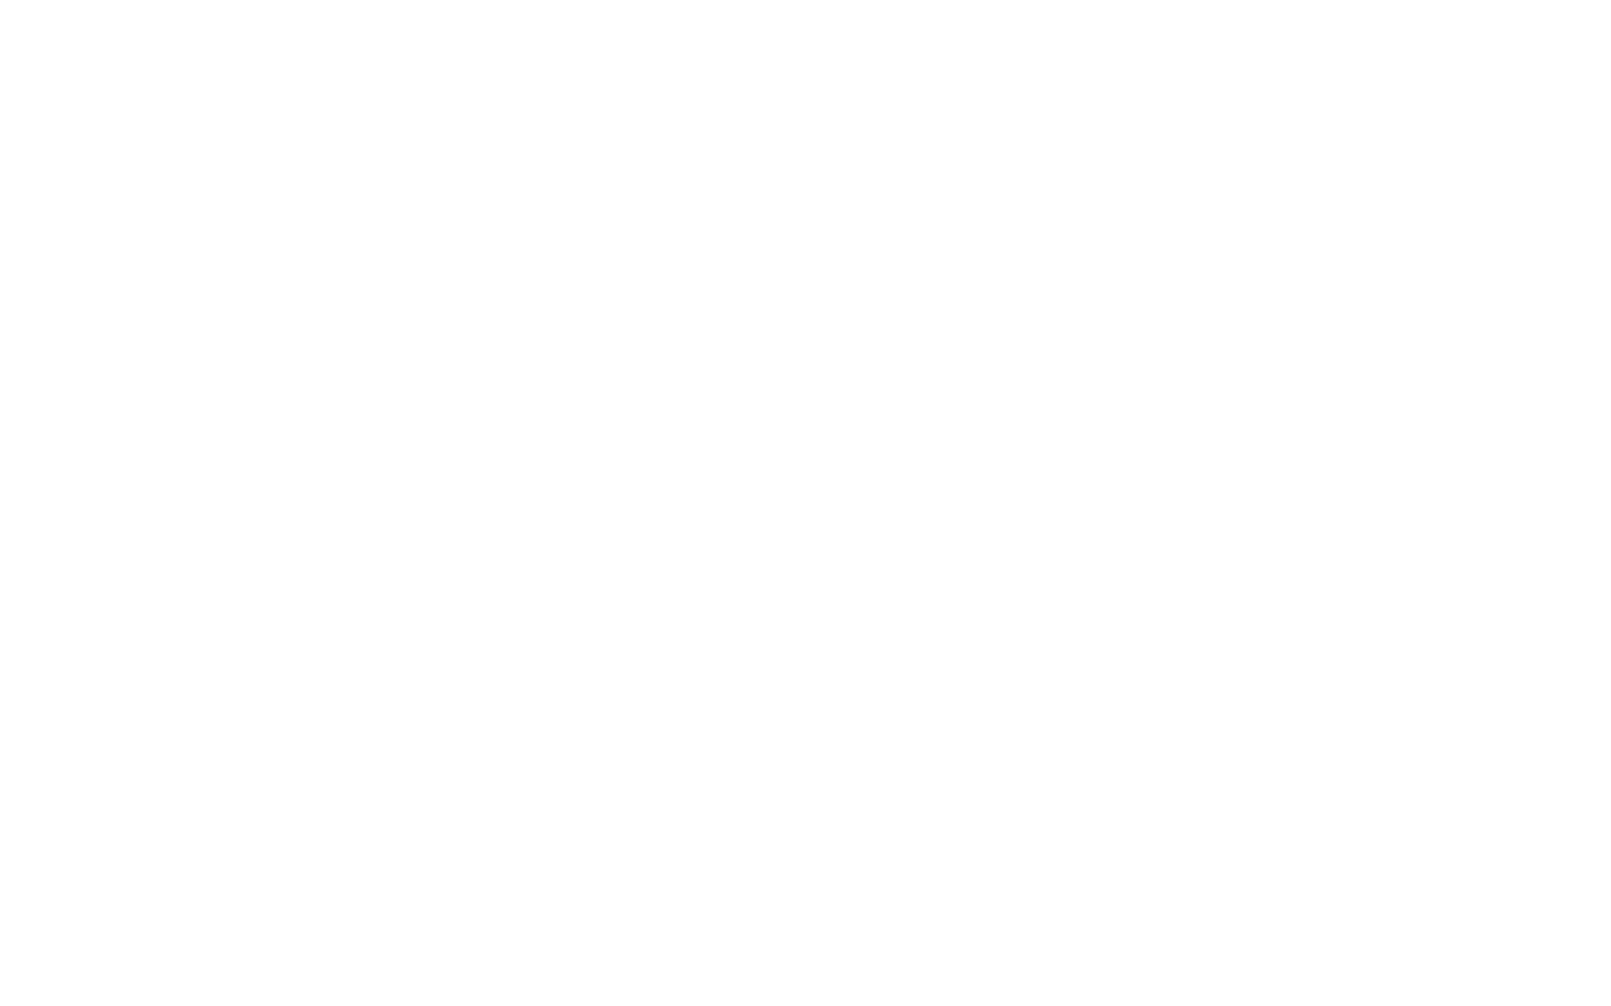 350films_FinalLogo_White